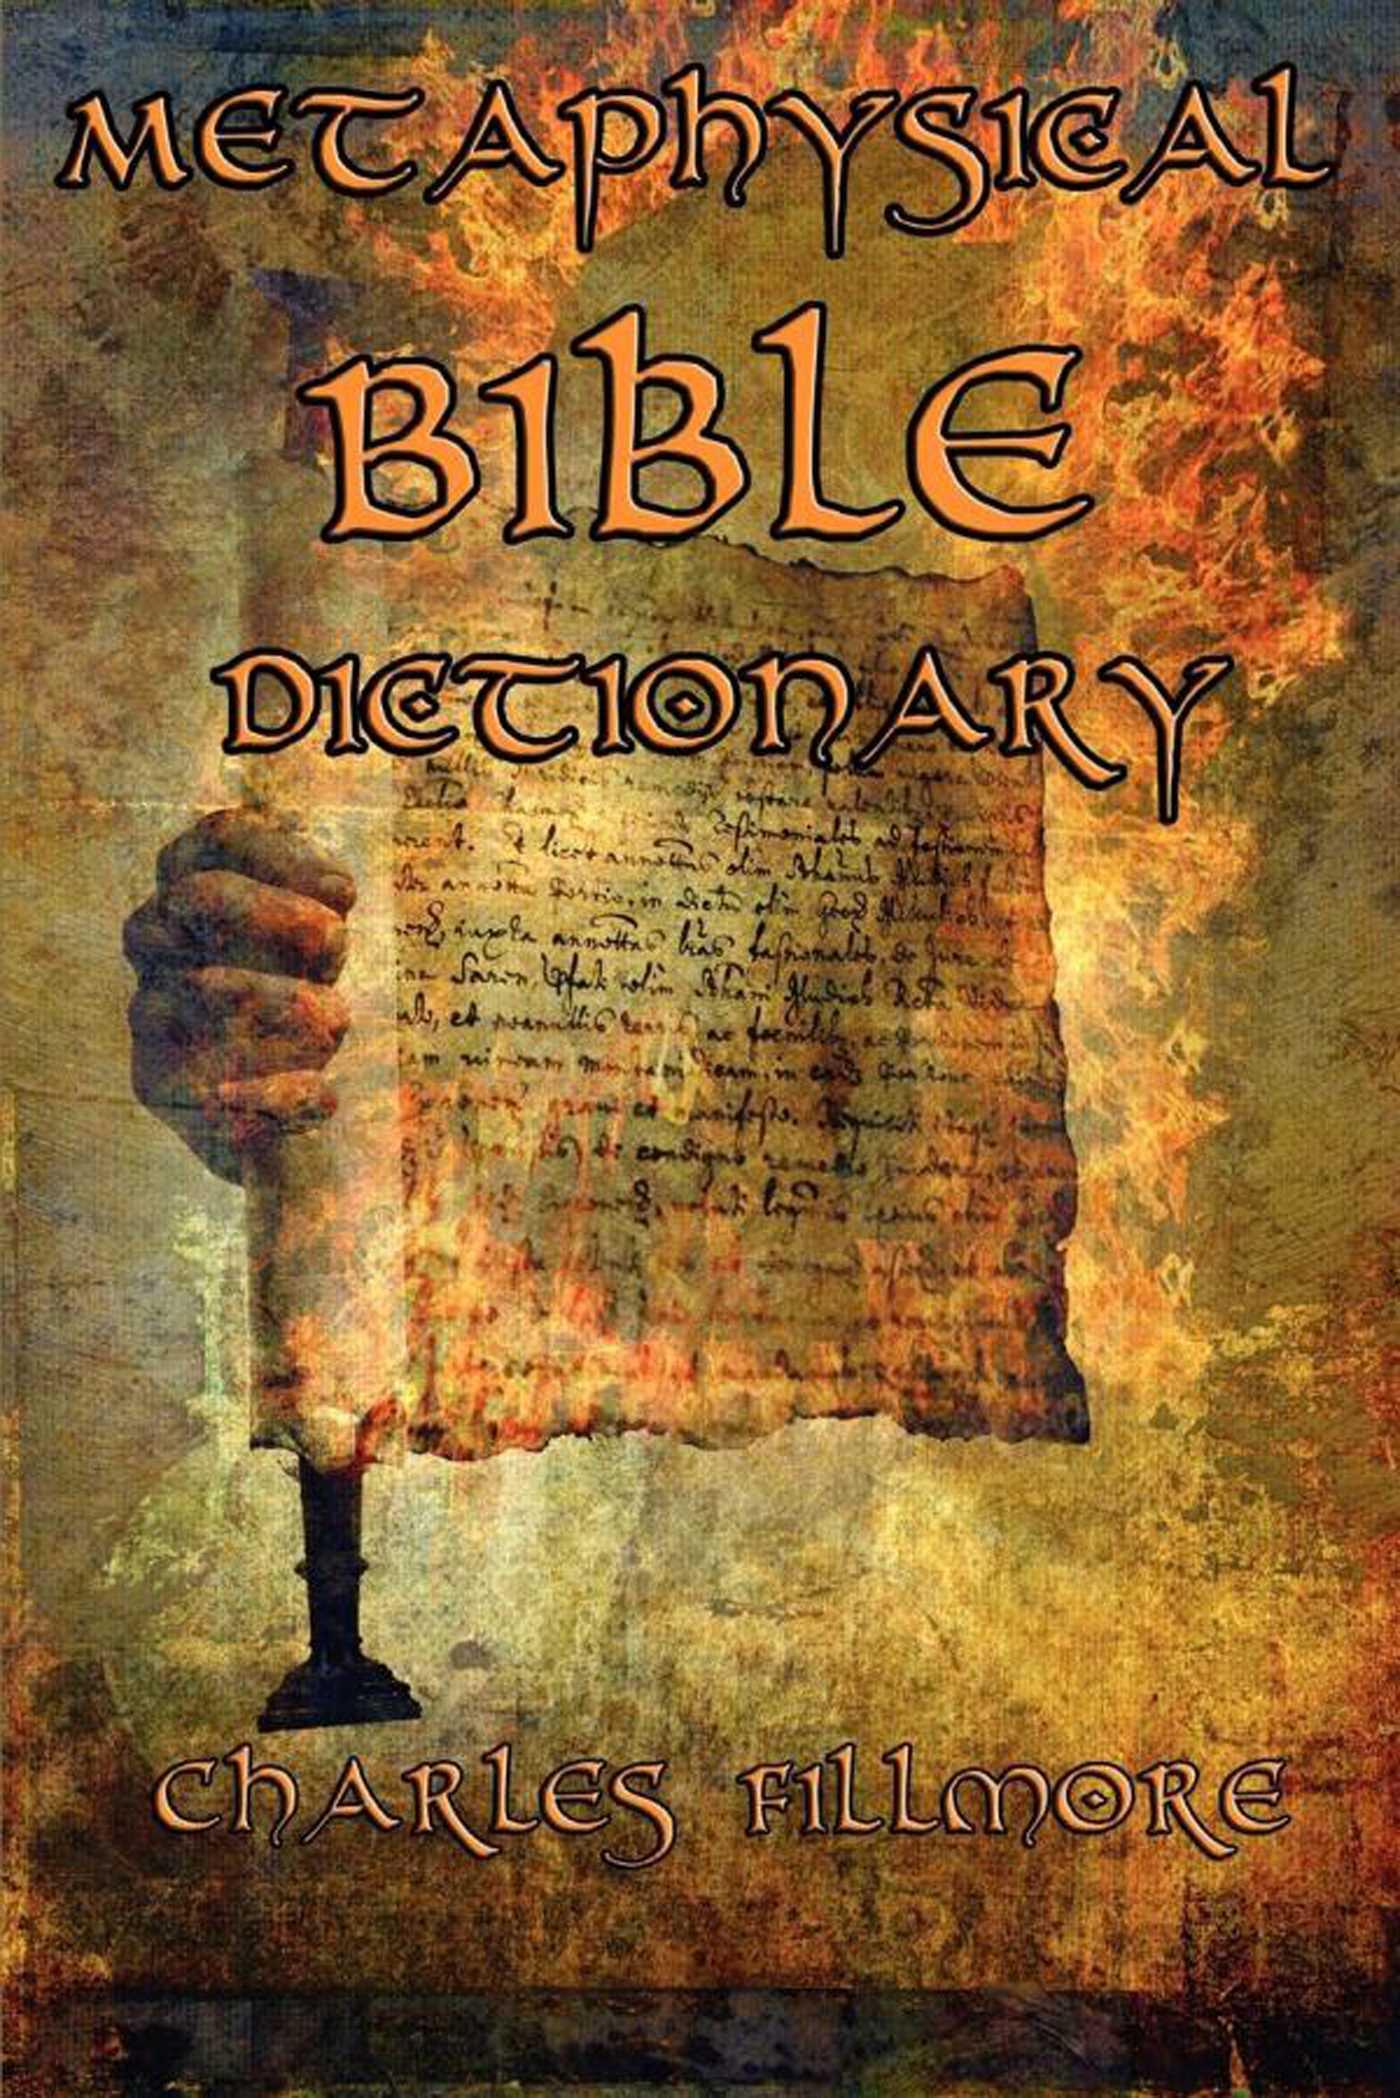 Metaphysical bible dictionary 9781625585134 hr